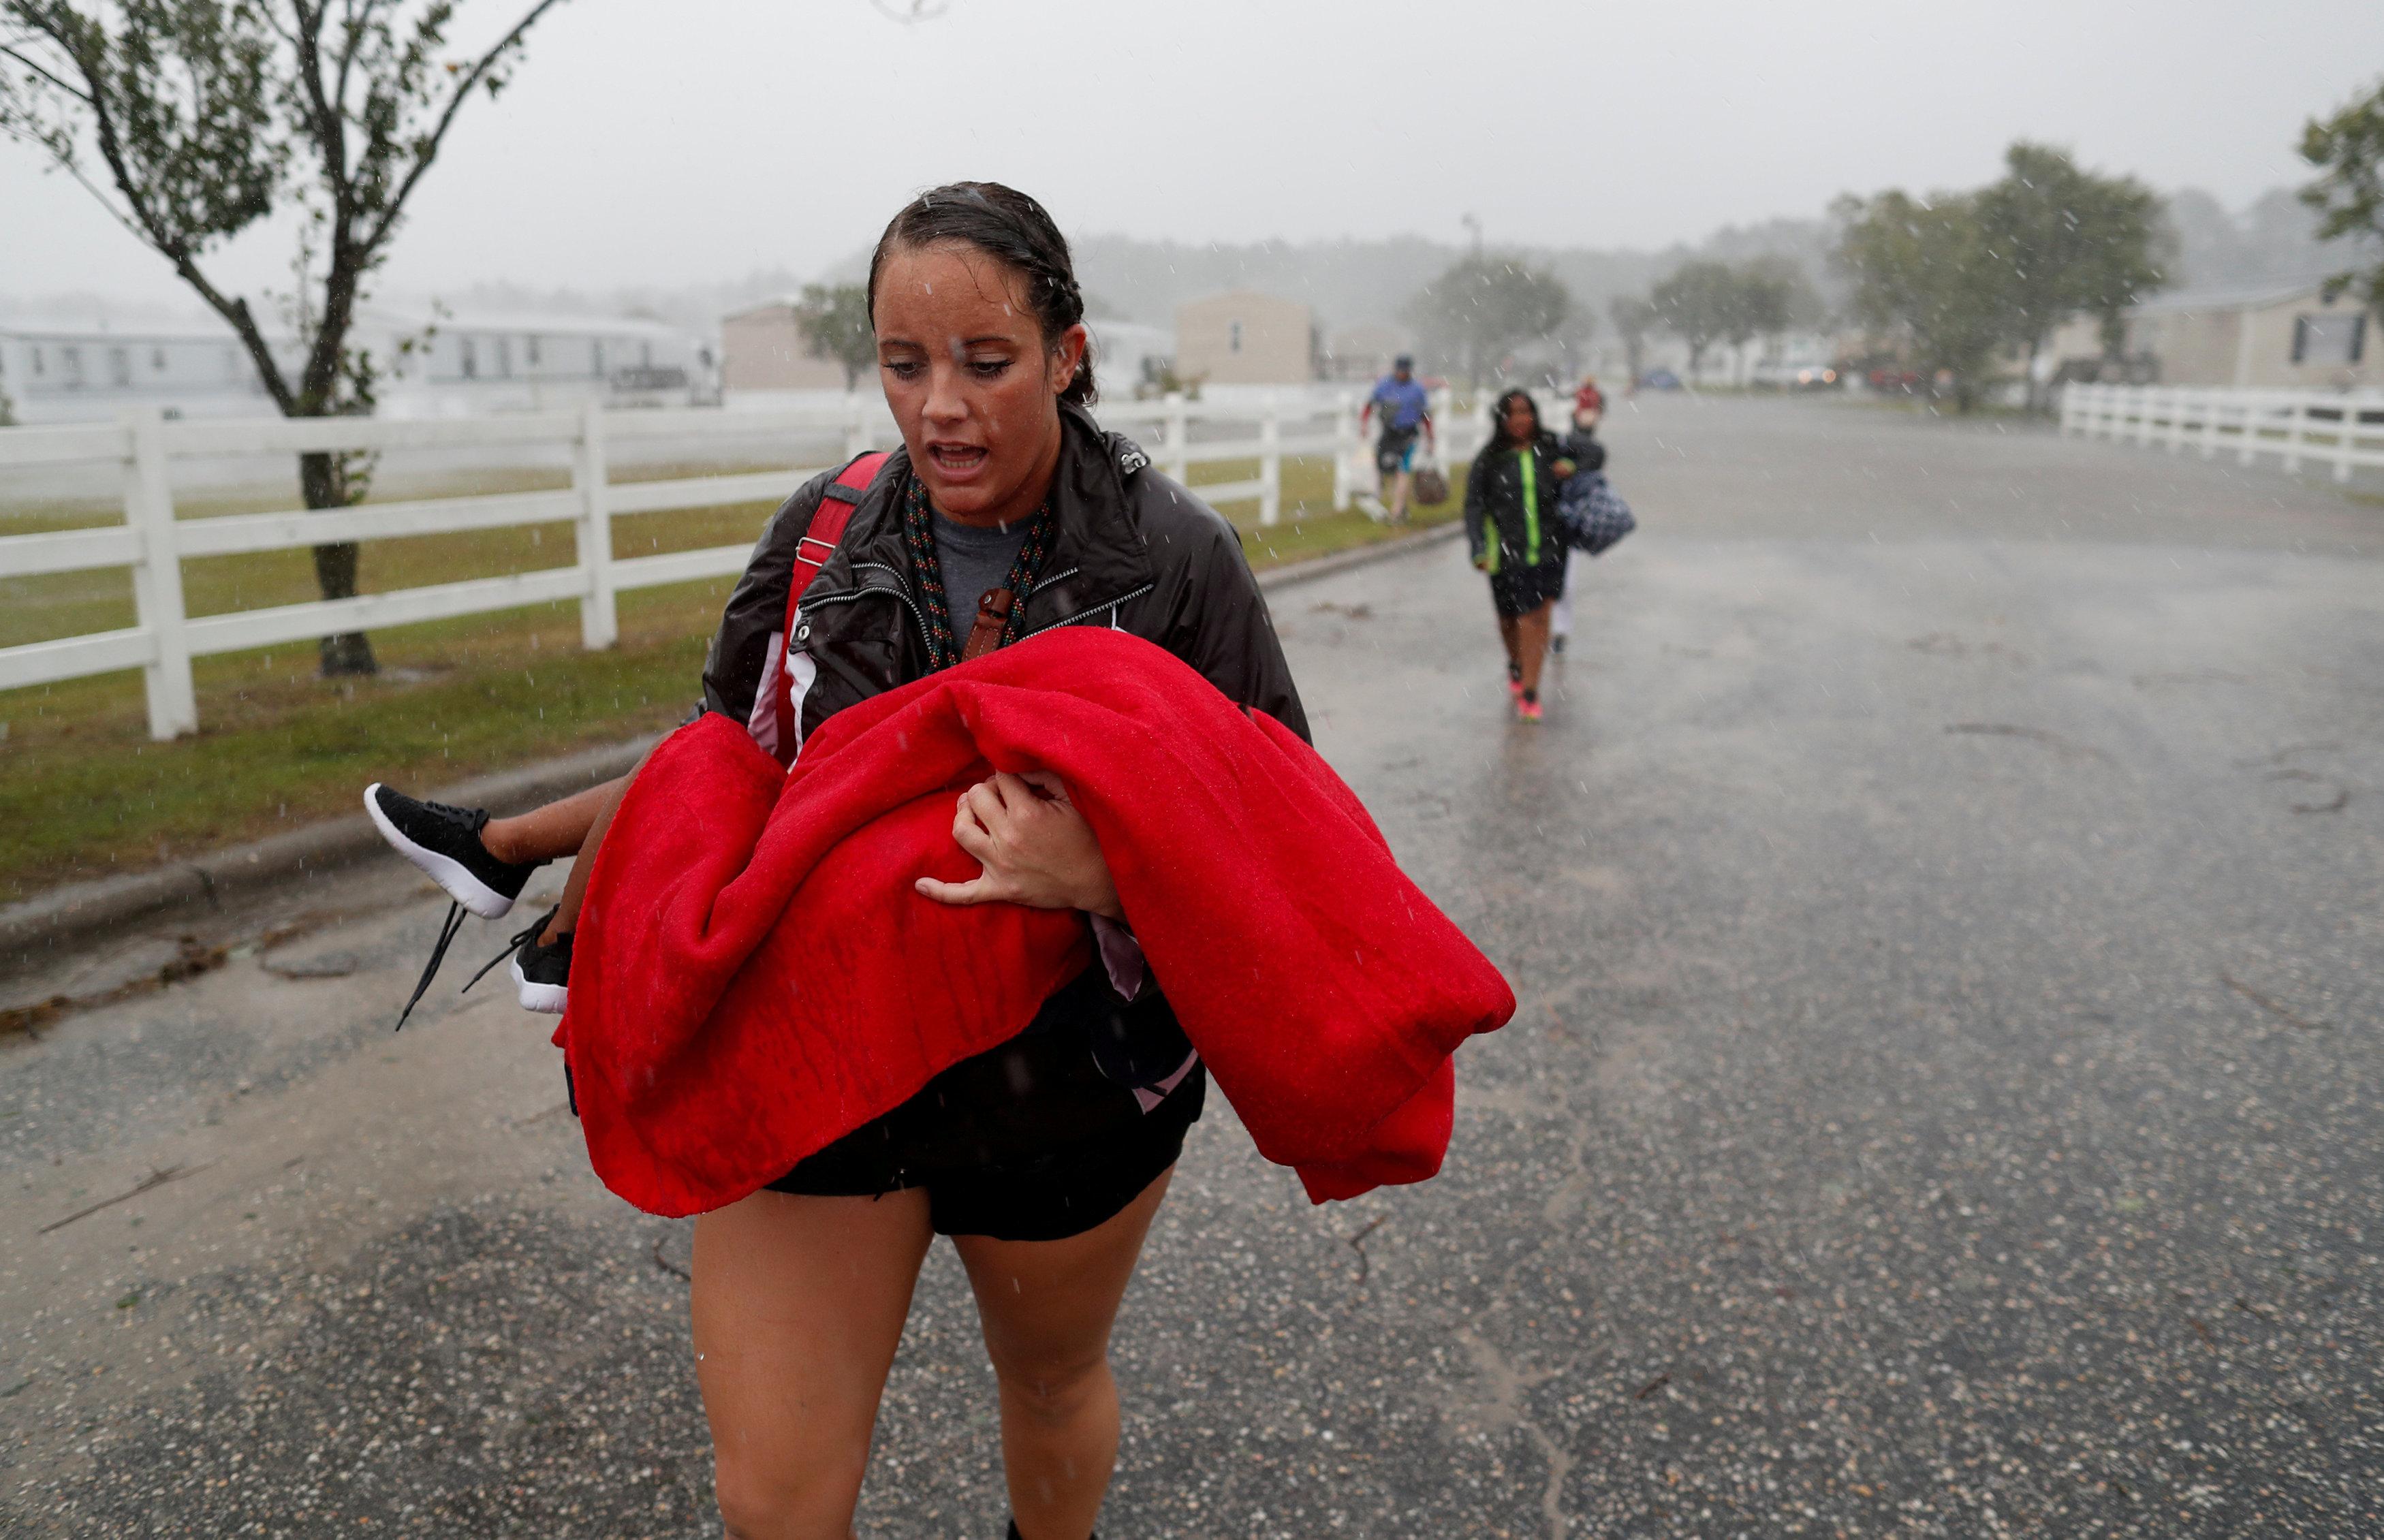 Pese a que Florence se degradó a tormenta tropical, las autoridades alertaron que podrían continuar las inundaciones y destrucciones(REUTERS/Randall Hill TPX IMAGES OF THE DAY)